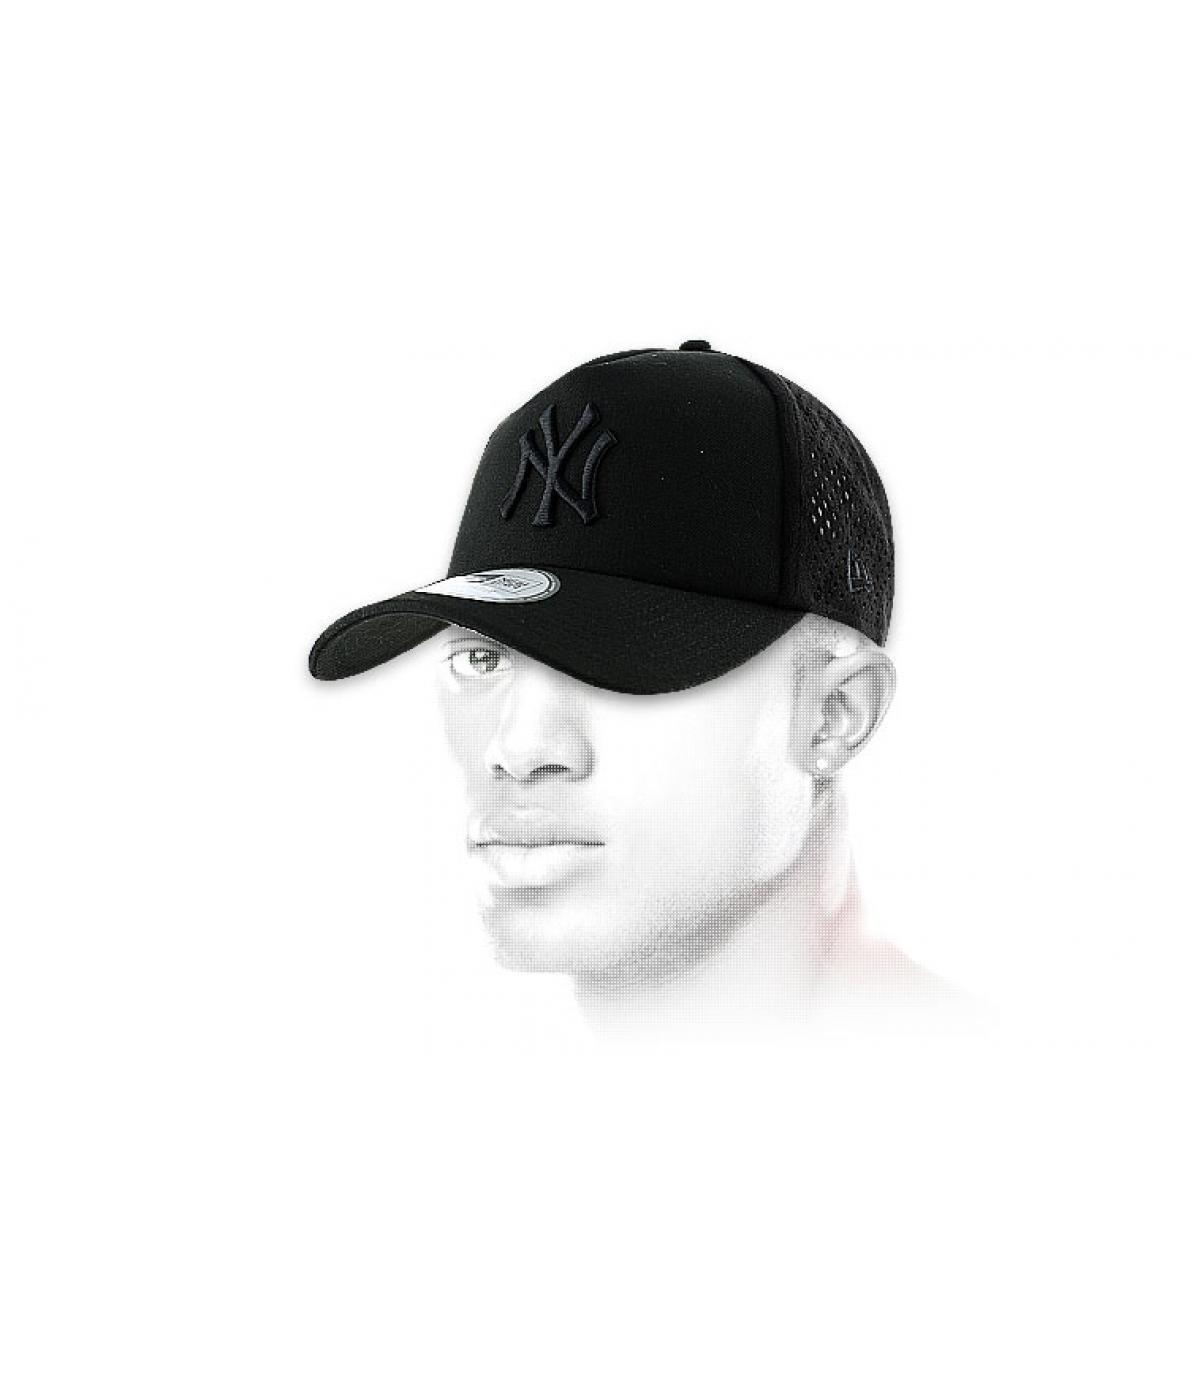 New era black mesh cap. Détails Mono perf NY black black - image 5  Détails  Mono perf NY black black - image ... 879c820accf